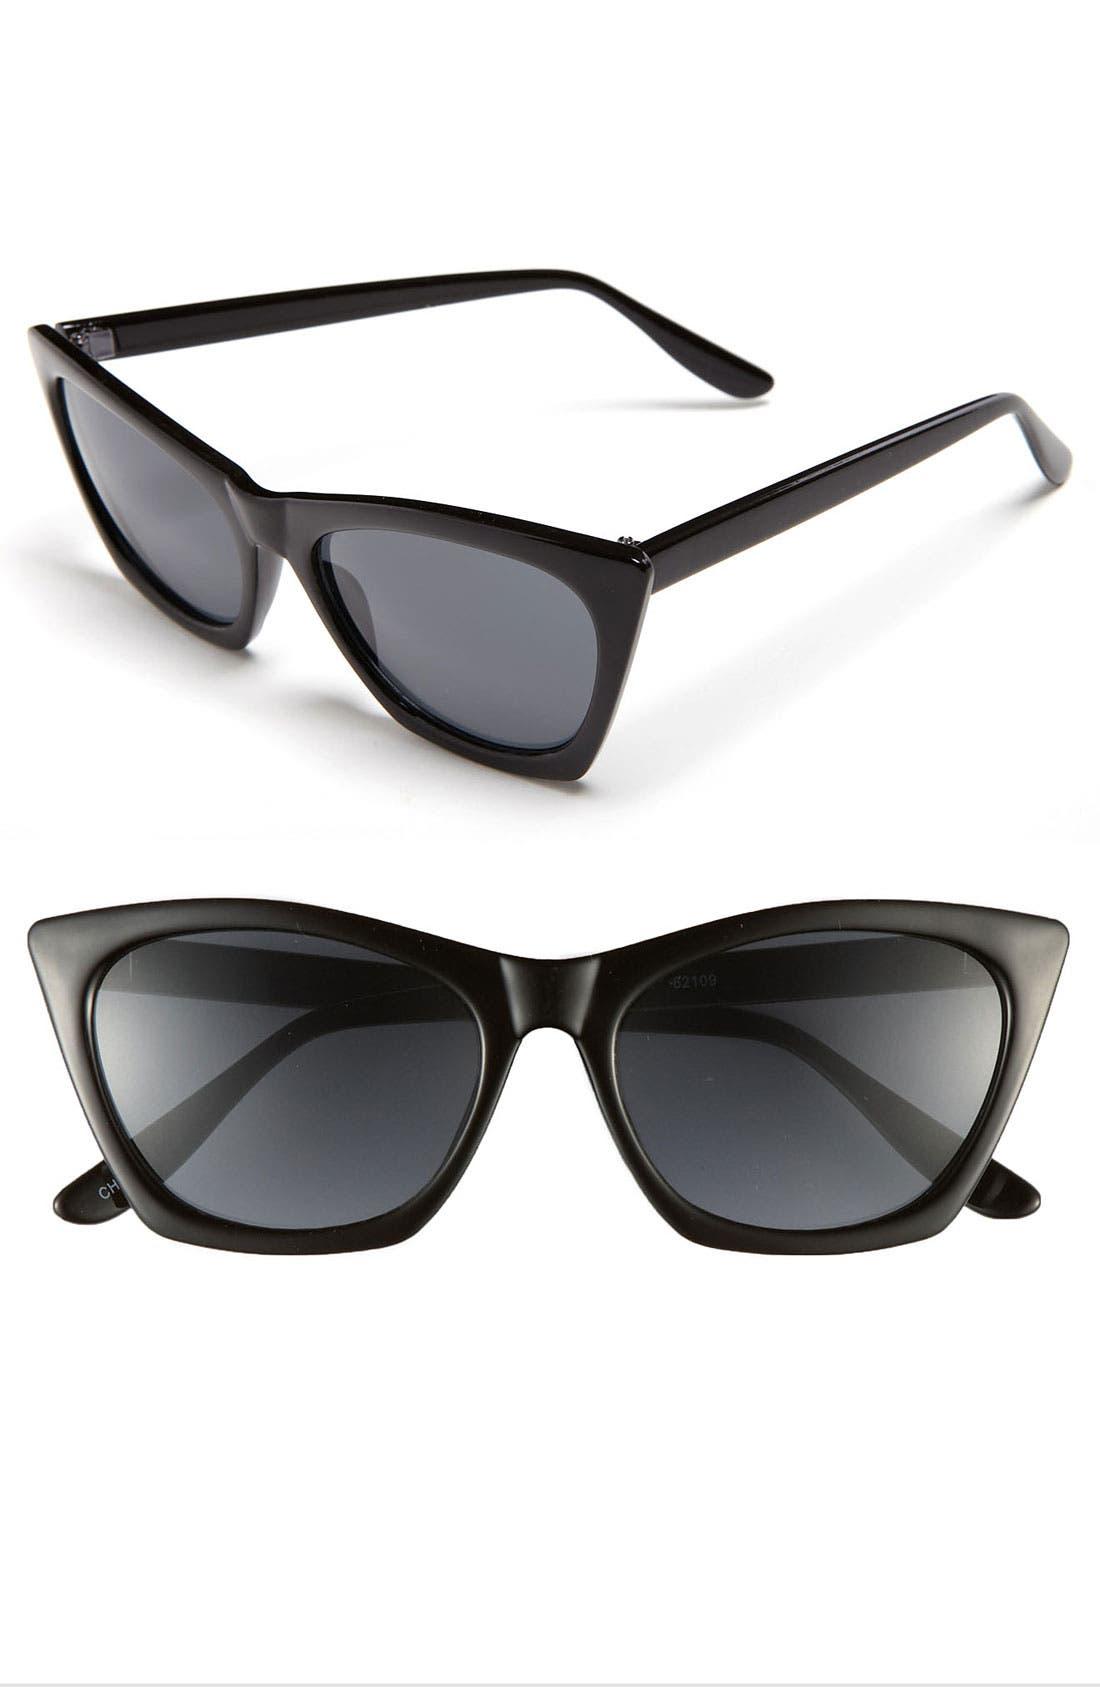 Main Image - A.J. Morgan 'Melanie' Sunglasses